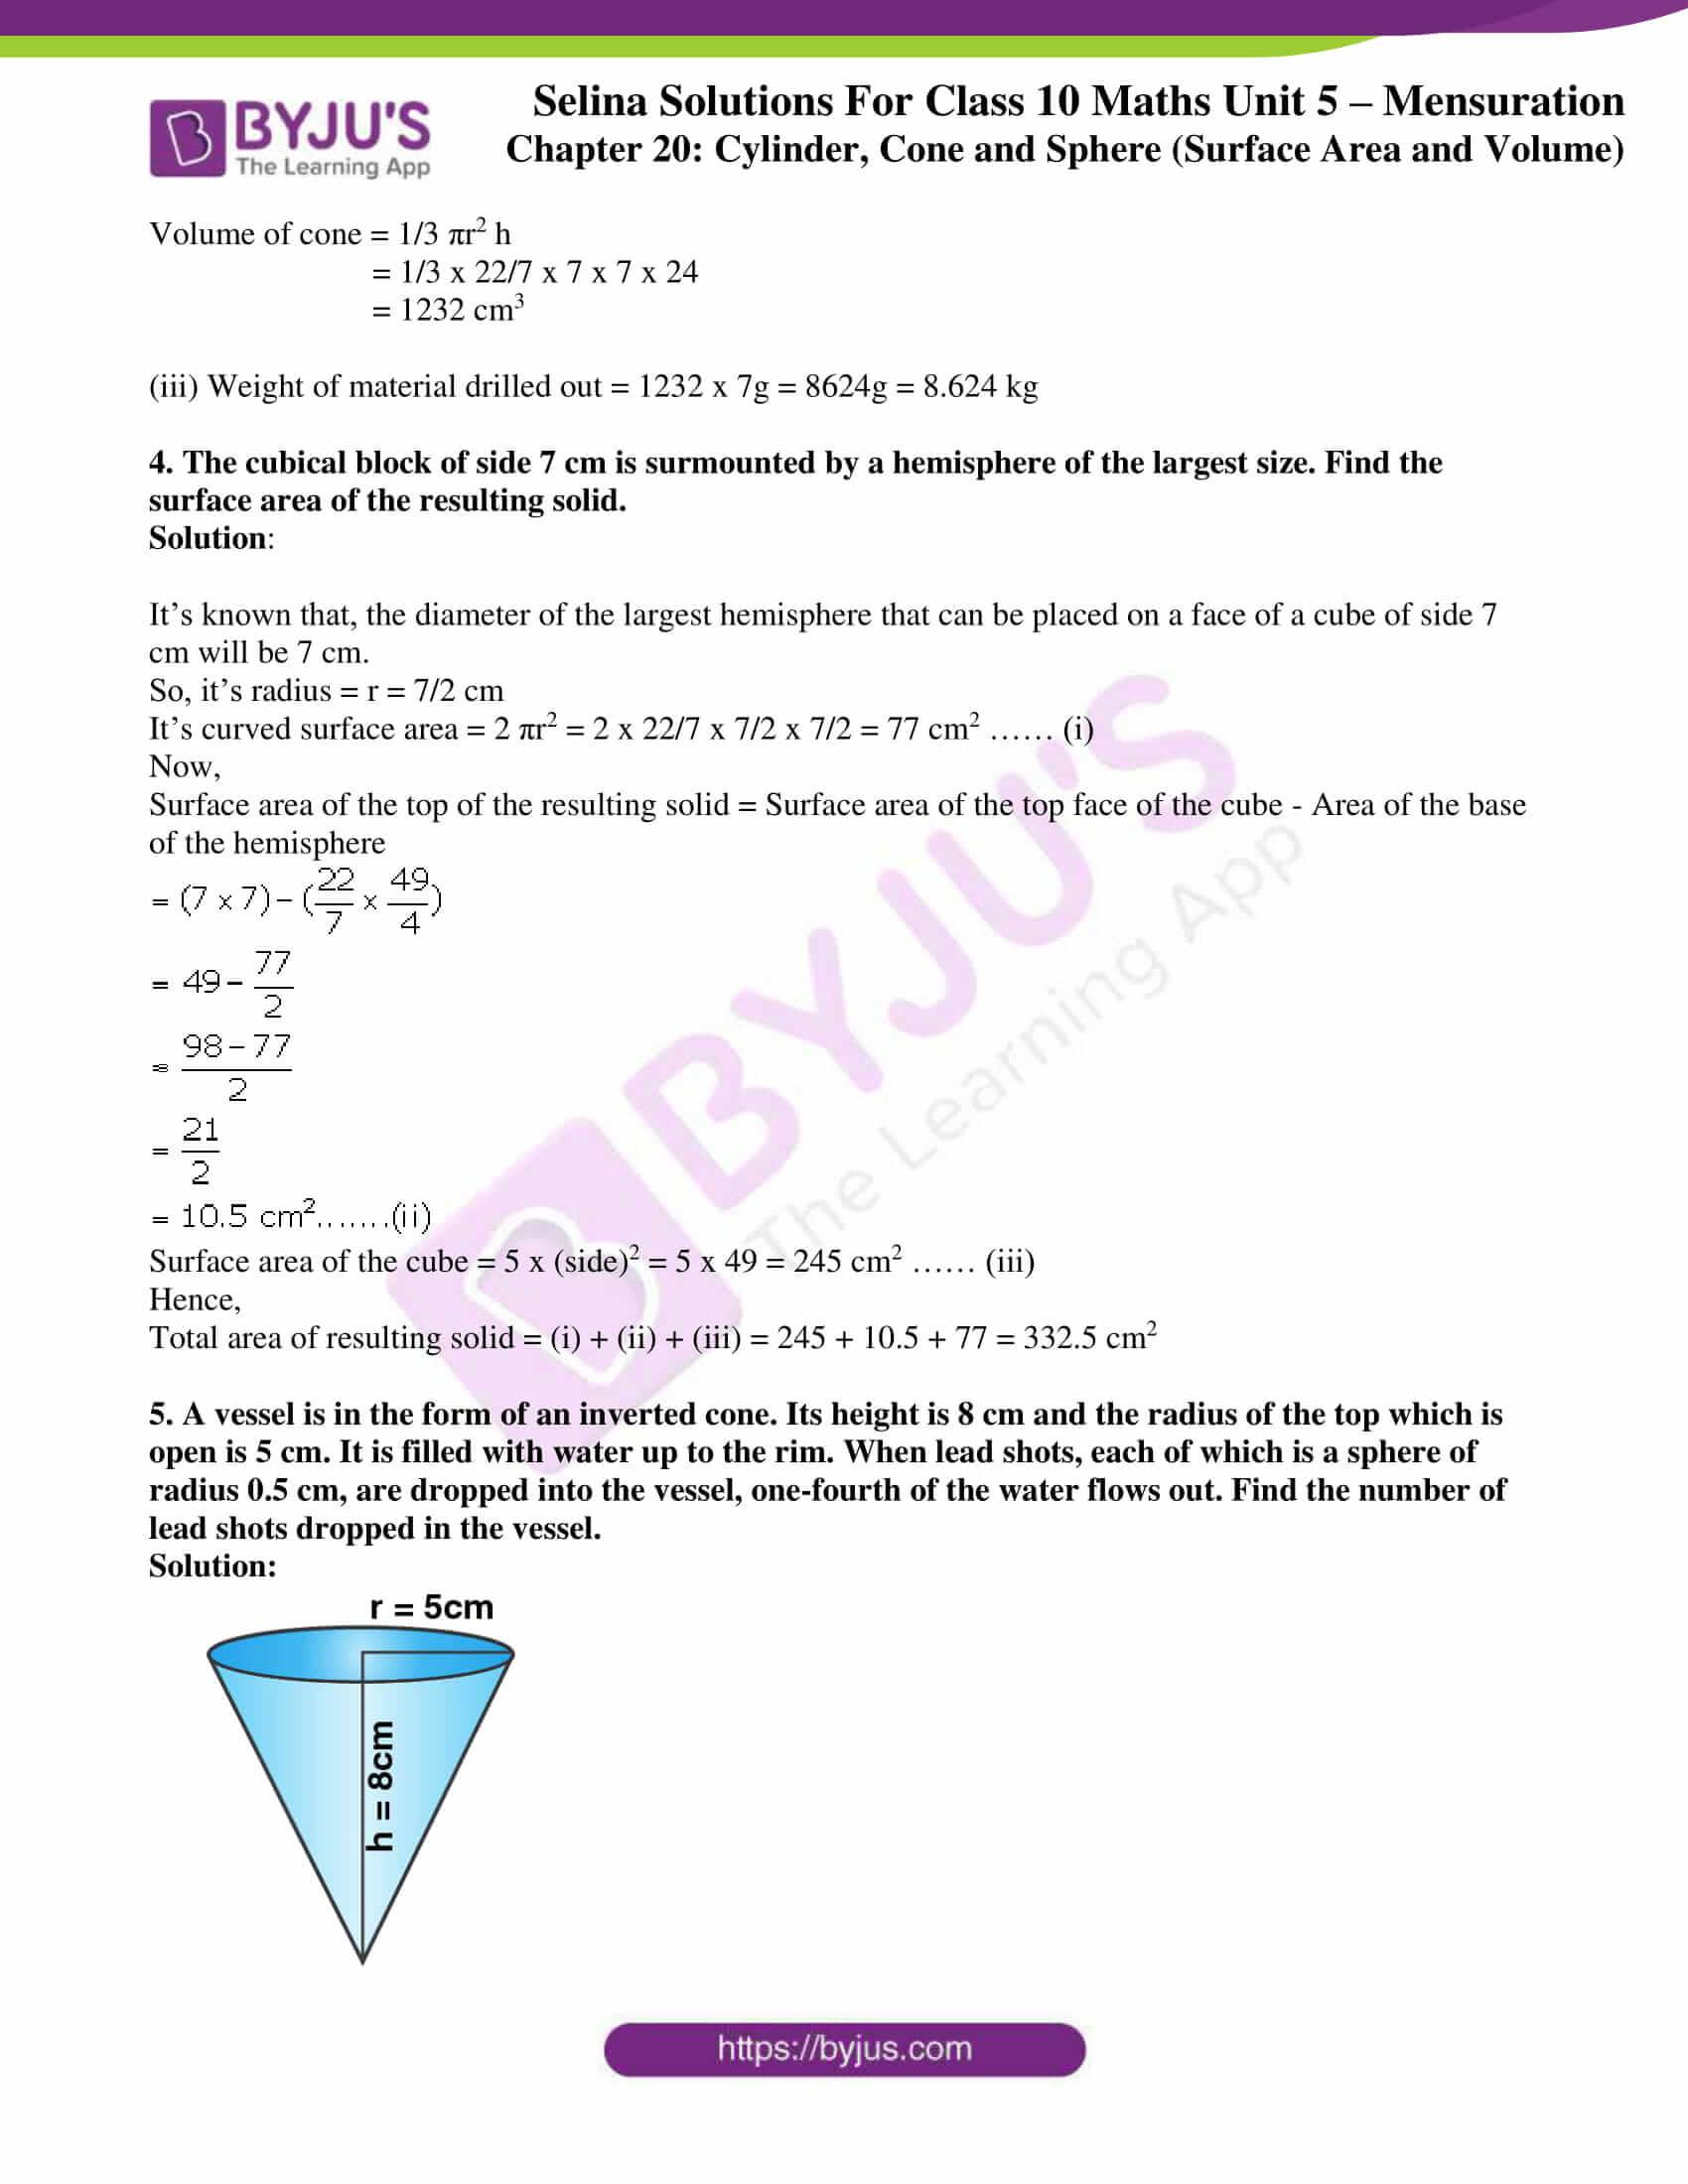 selina-sol-maths-class-10-ch-20-ex-e-3